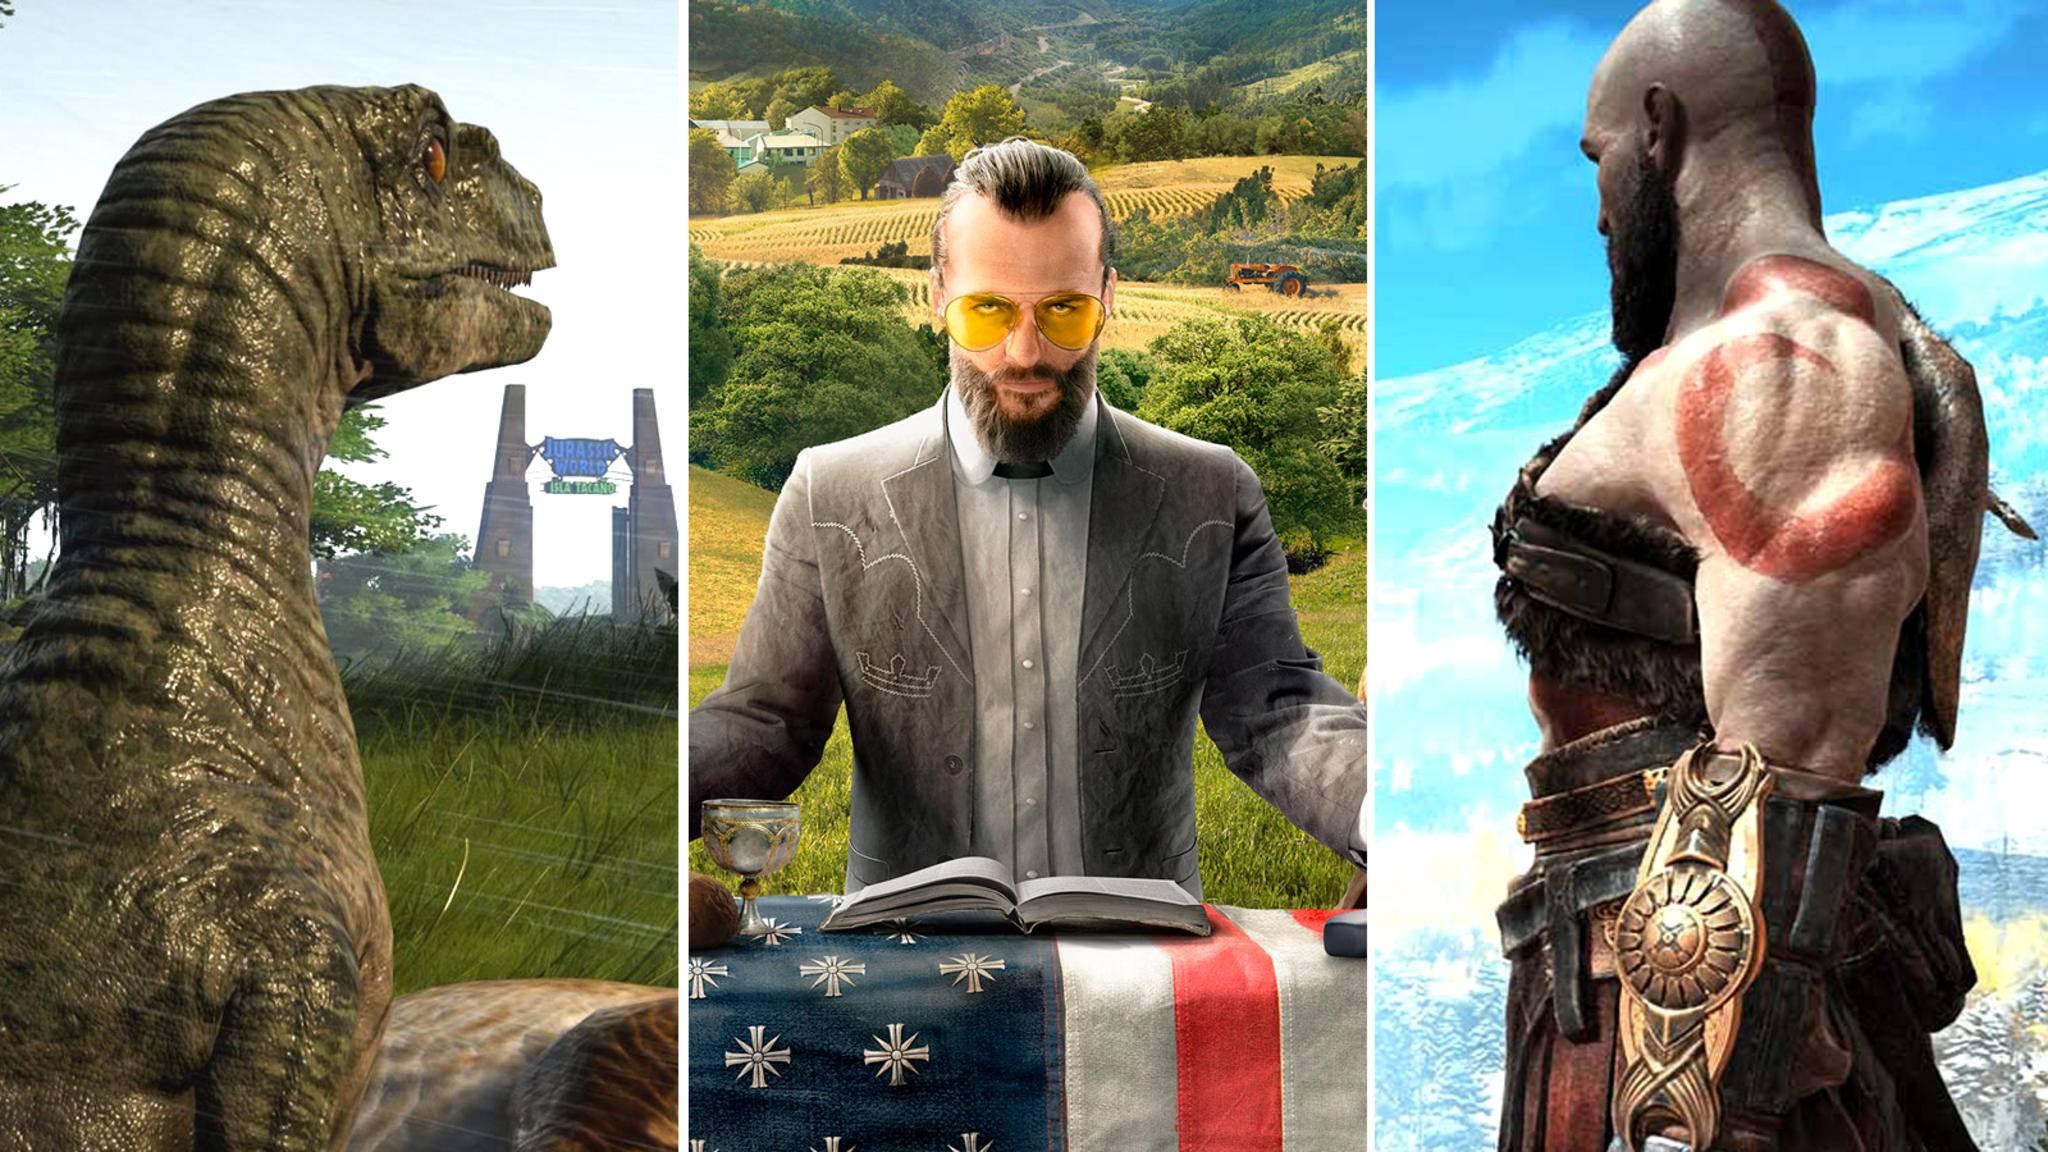 games-2018-jurassic-world-evo-far-cry-5-god-of-war-frontier-developments-ubisoft-sony